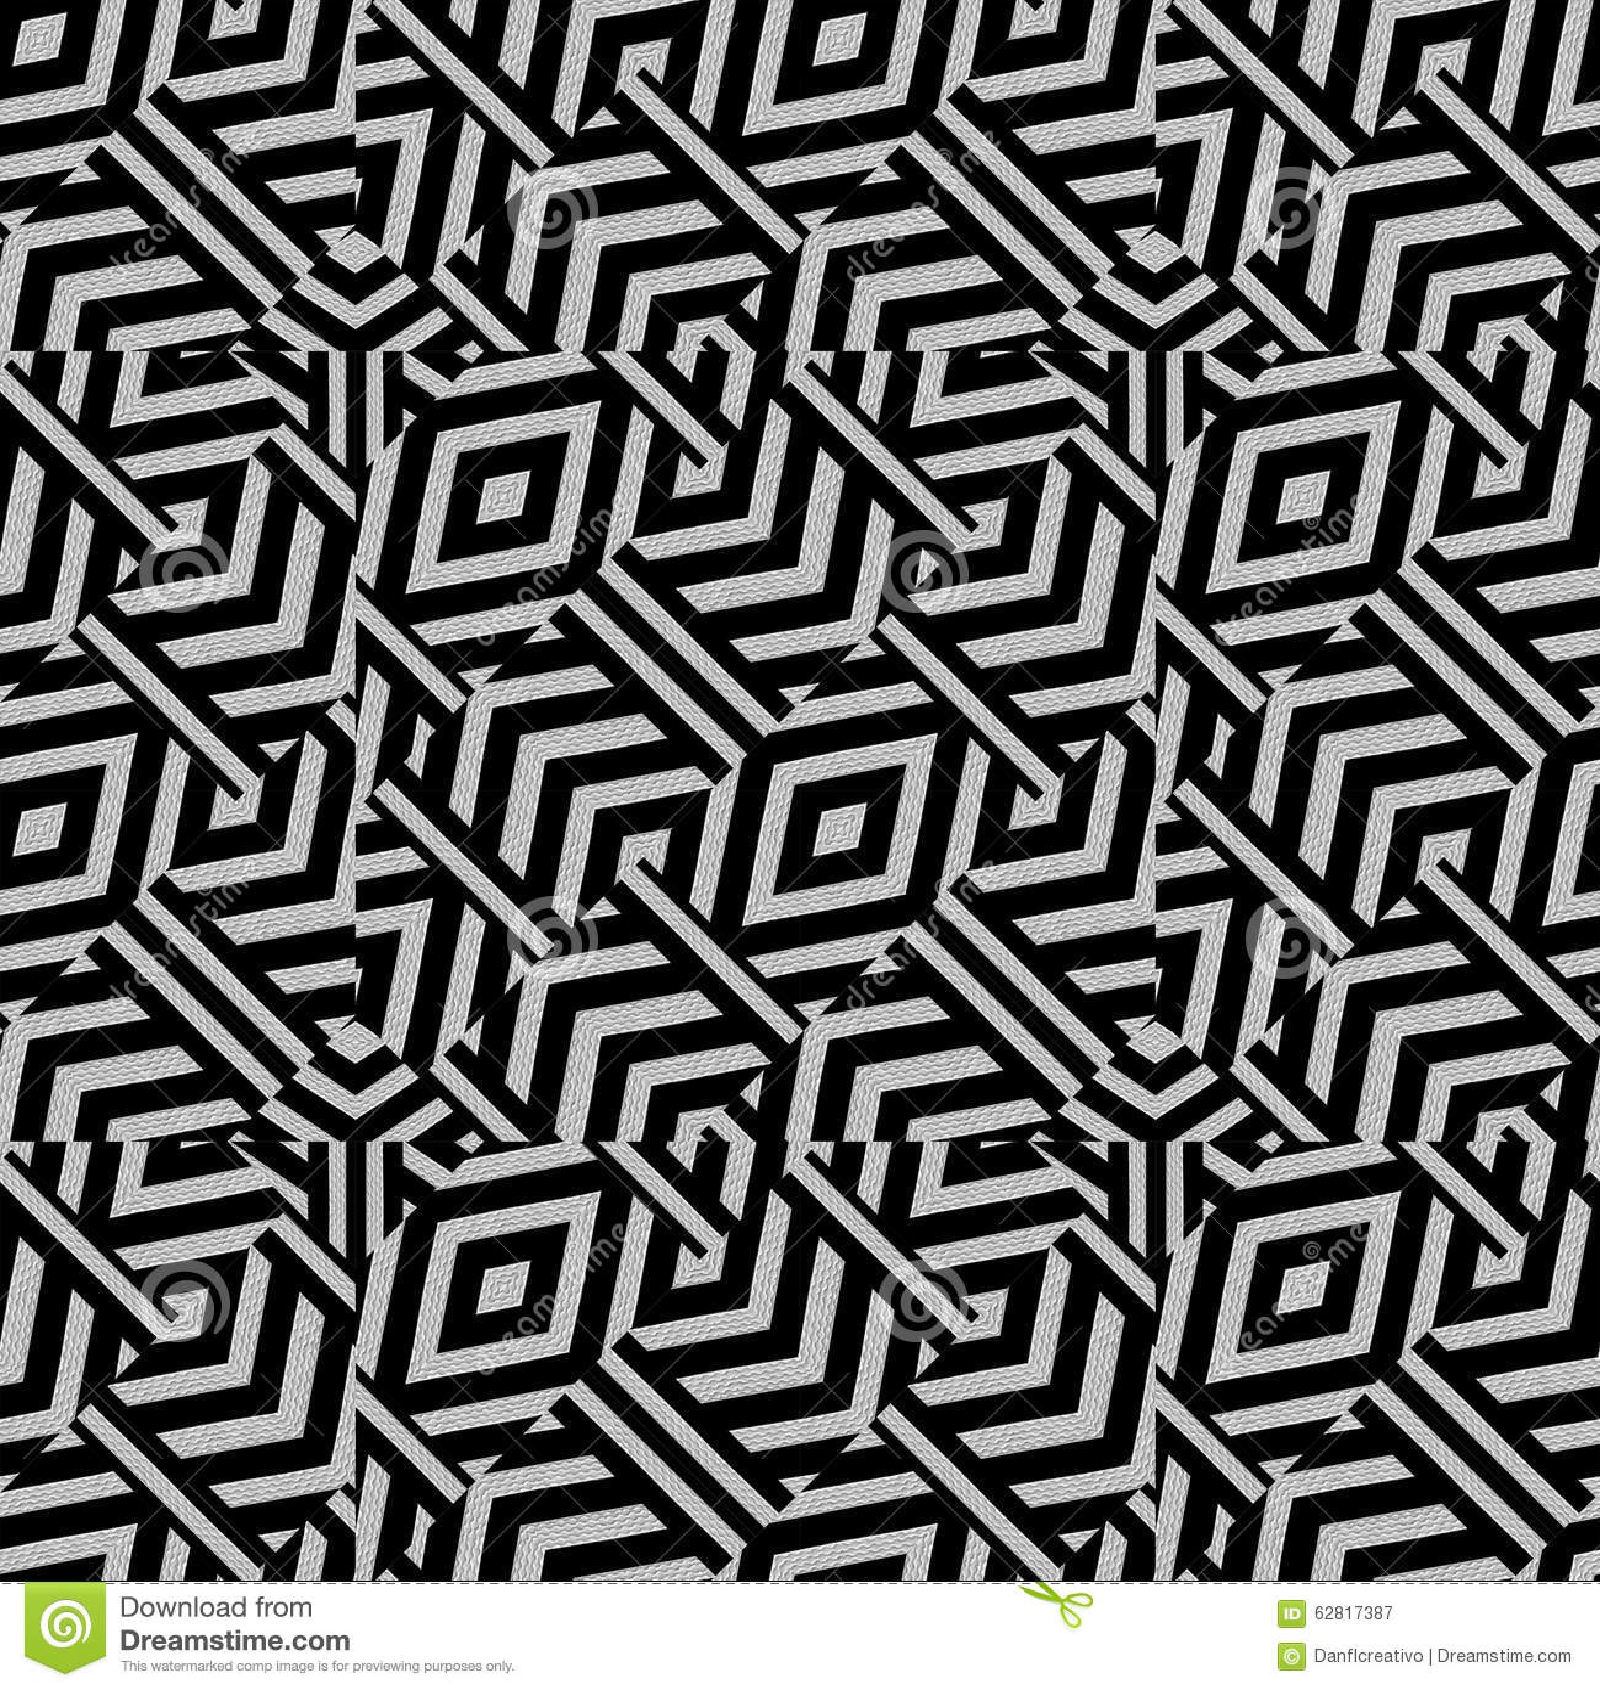 Uncategorized Intricate Pattern geometric intricate abstract pattern stock illustration image royalty free download pattern